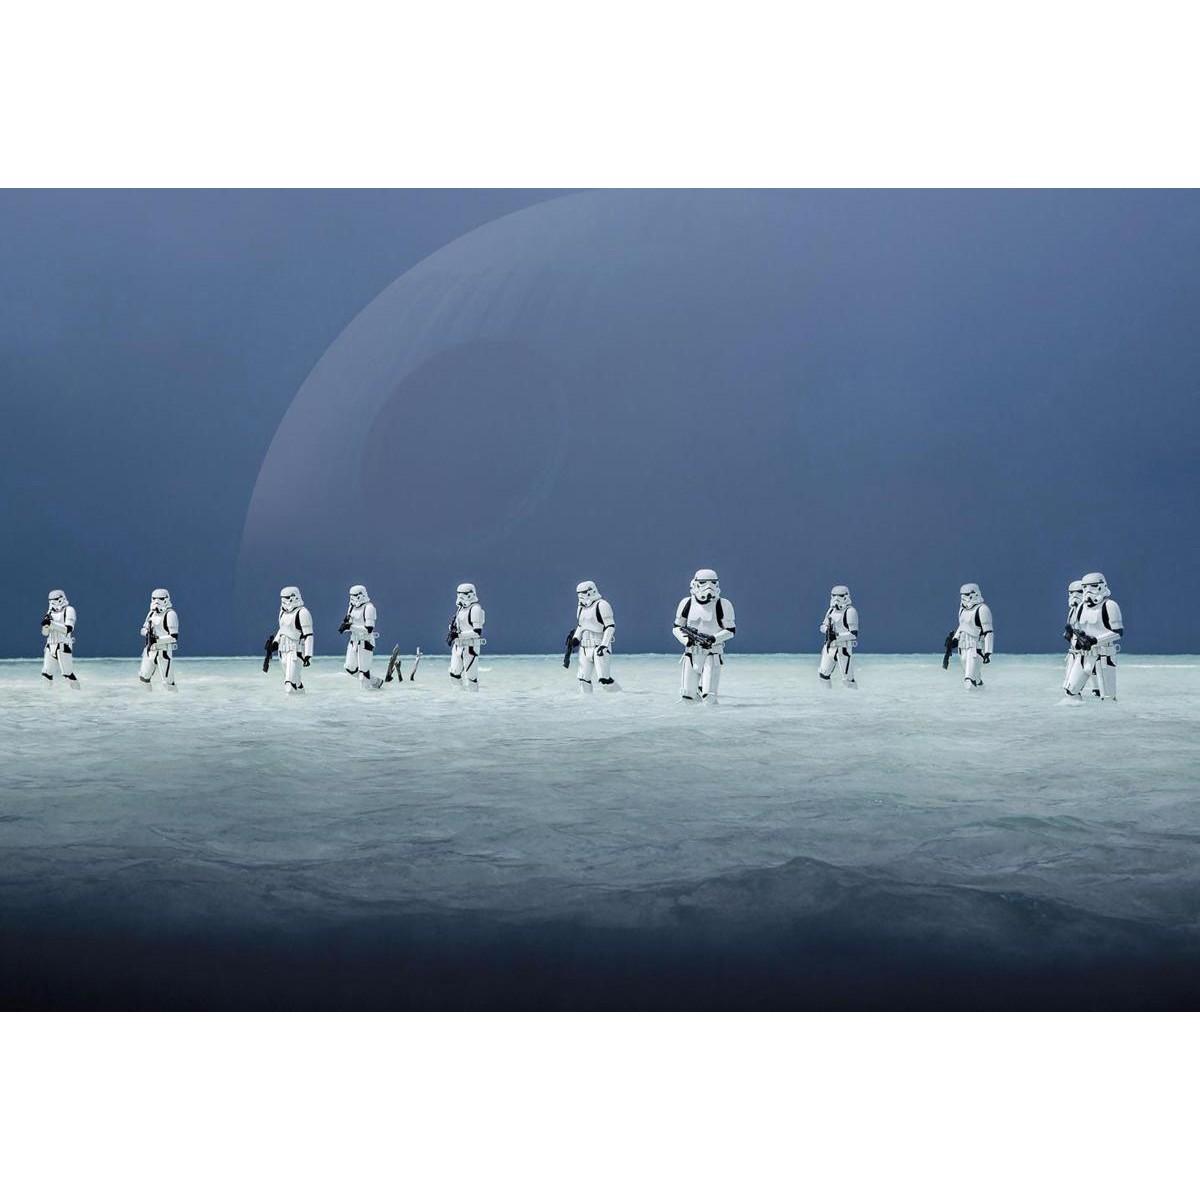 Фотообои Komar STAR WARS Scarif Beach 8-444 368х254 см